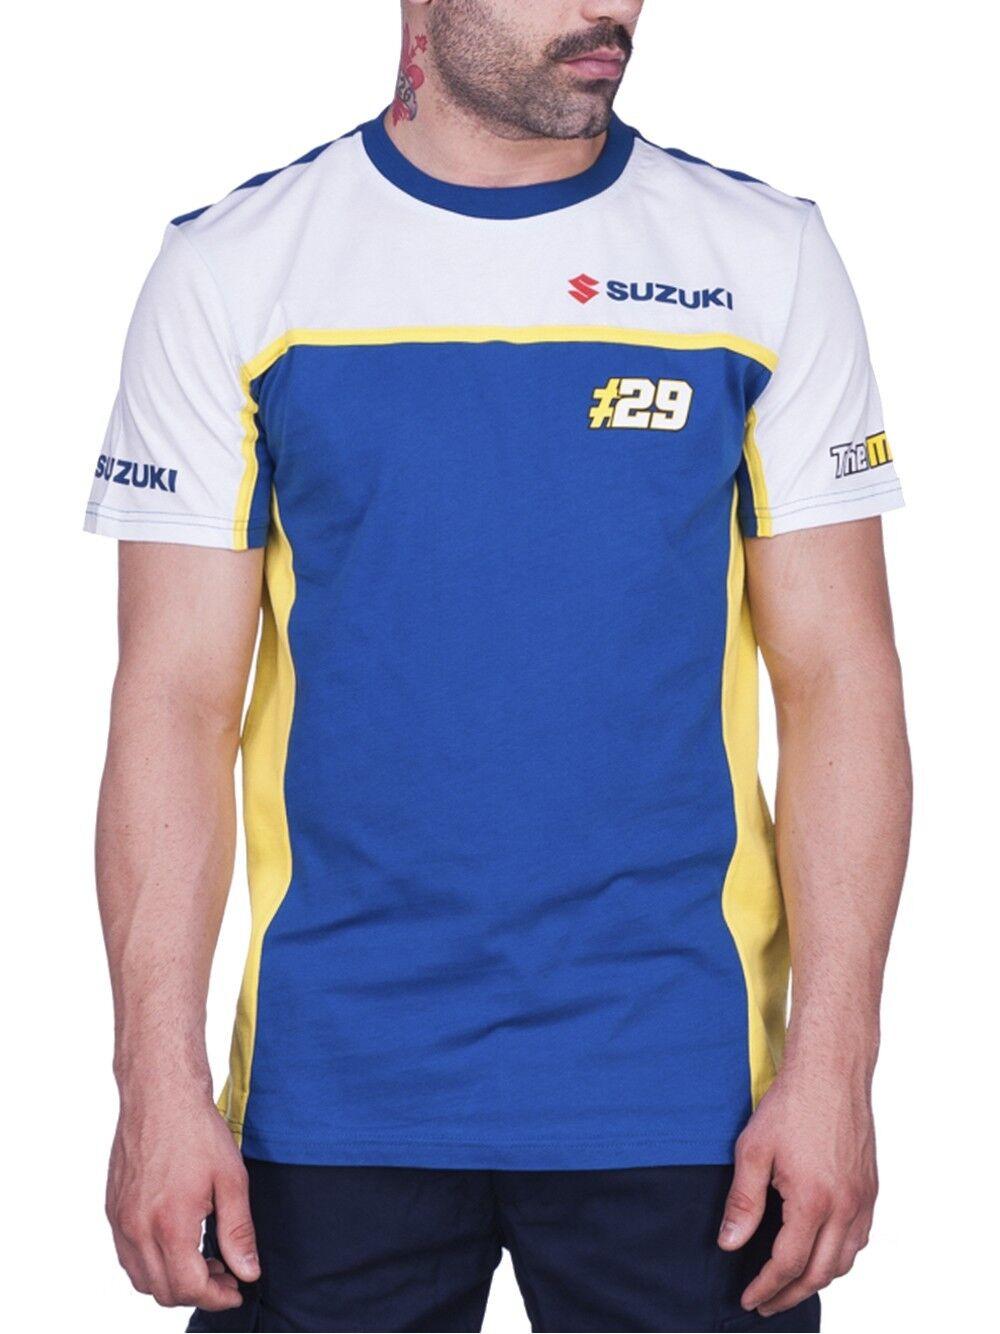 New Official Andrea Ianonne 29 Dual Suzuki T shirt - 17 39009